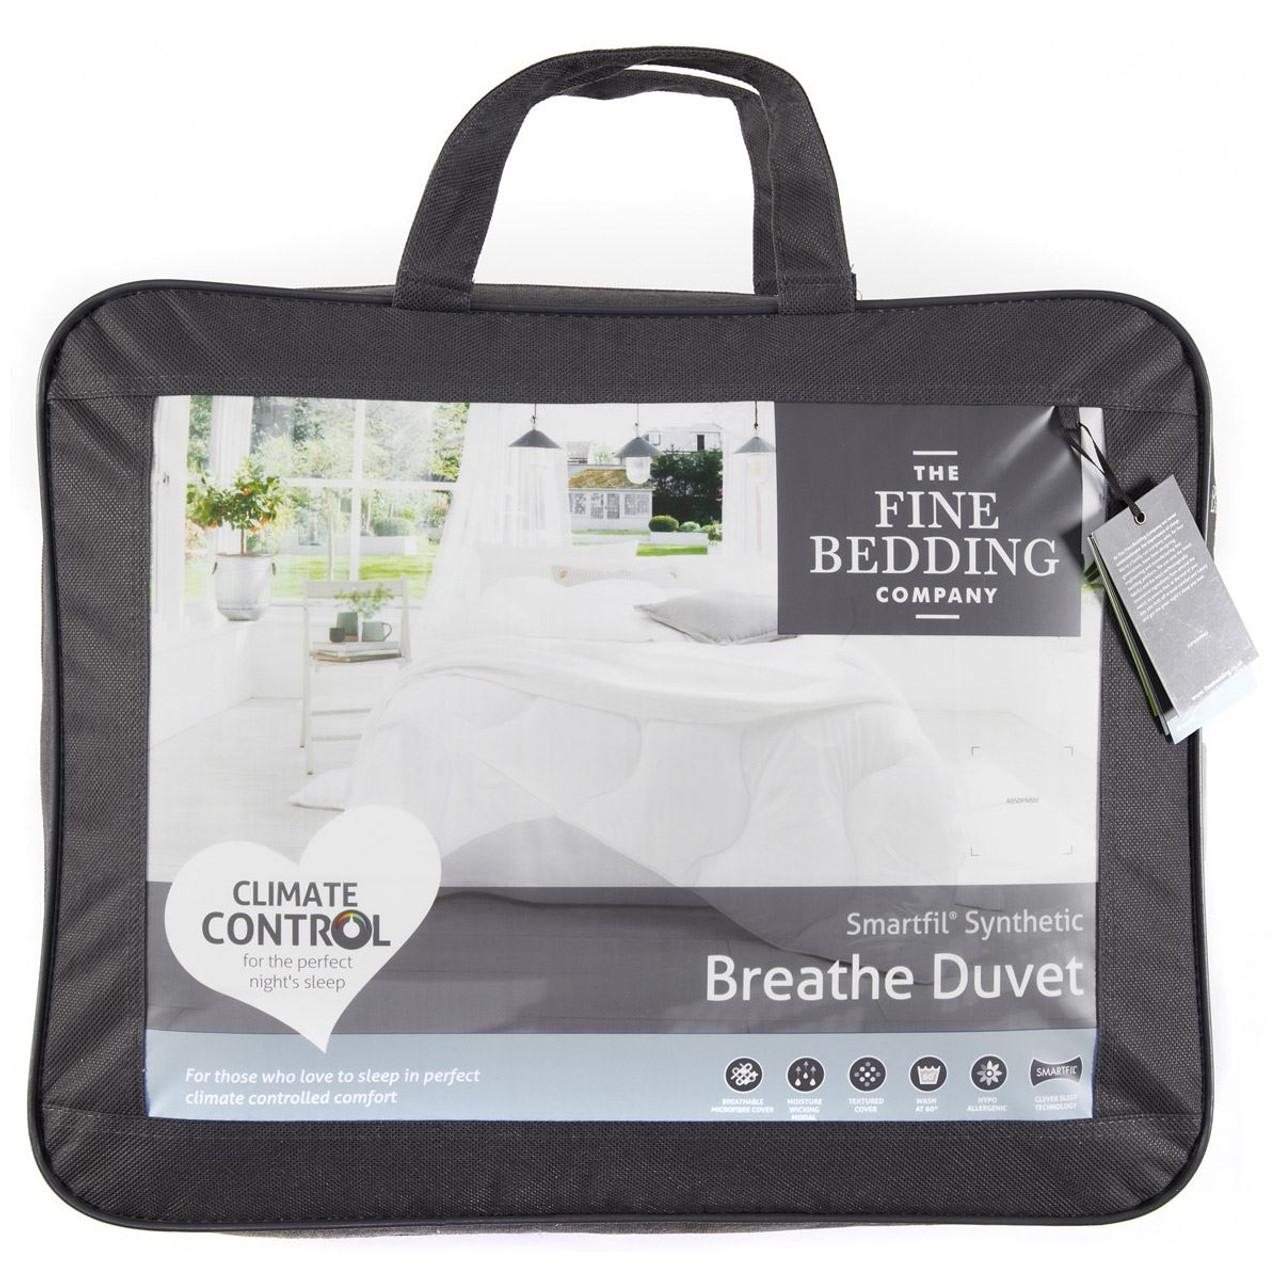 The Fine Bedding Company Breathe Duvet